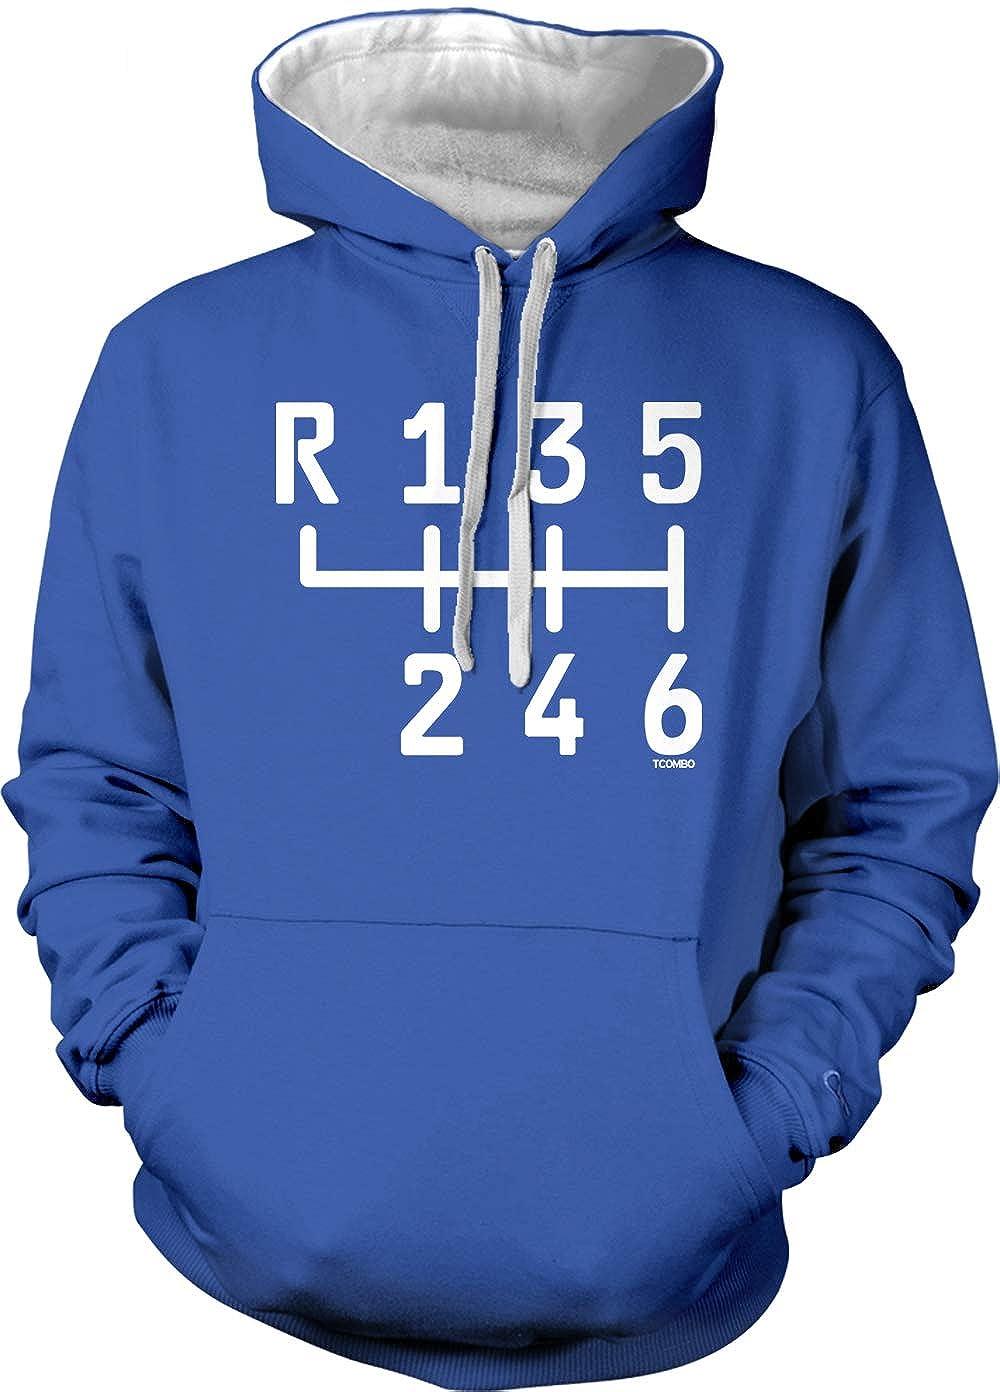 Royal Blue//White Strings, XX-Large Gear Stick Adult Two Tone Hoodie Sweatshirt